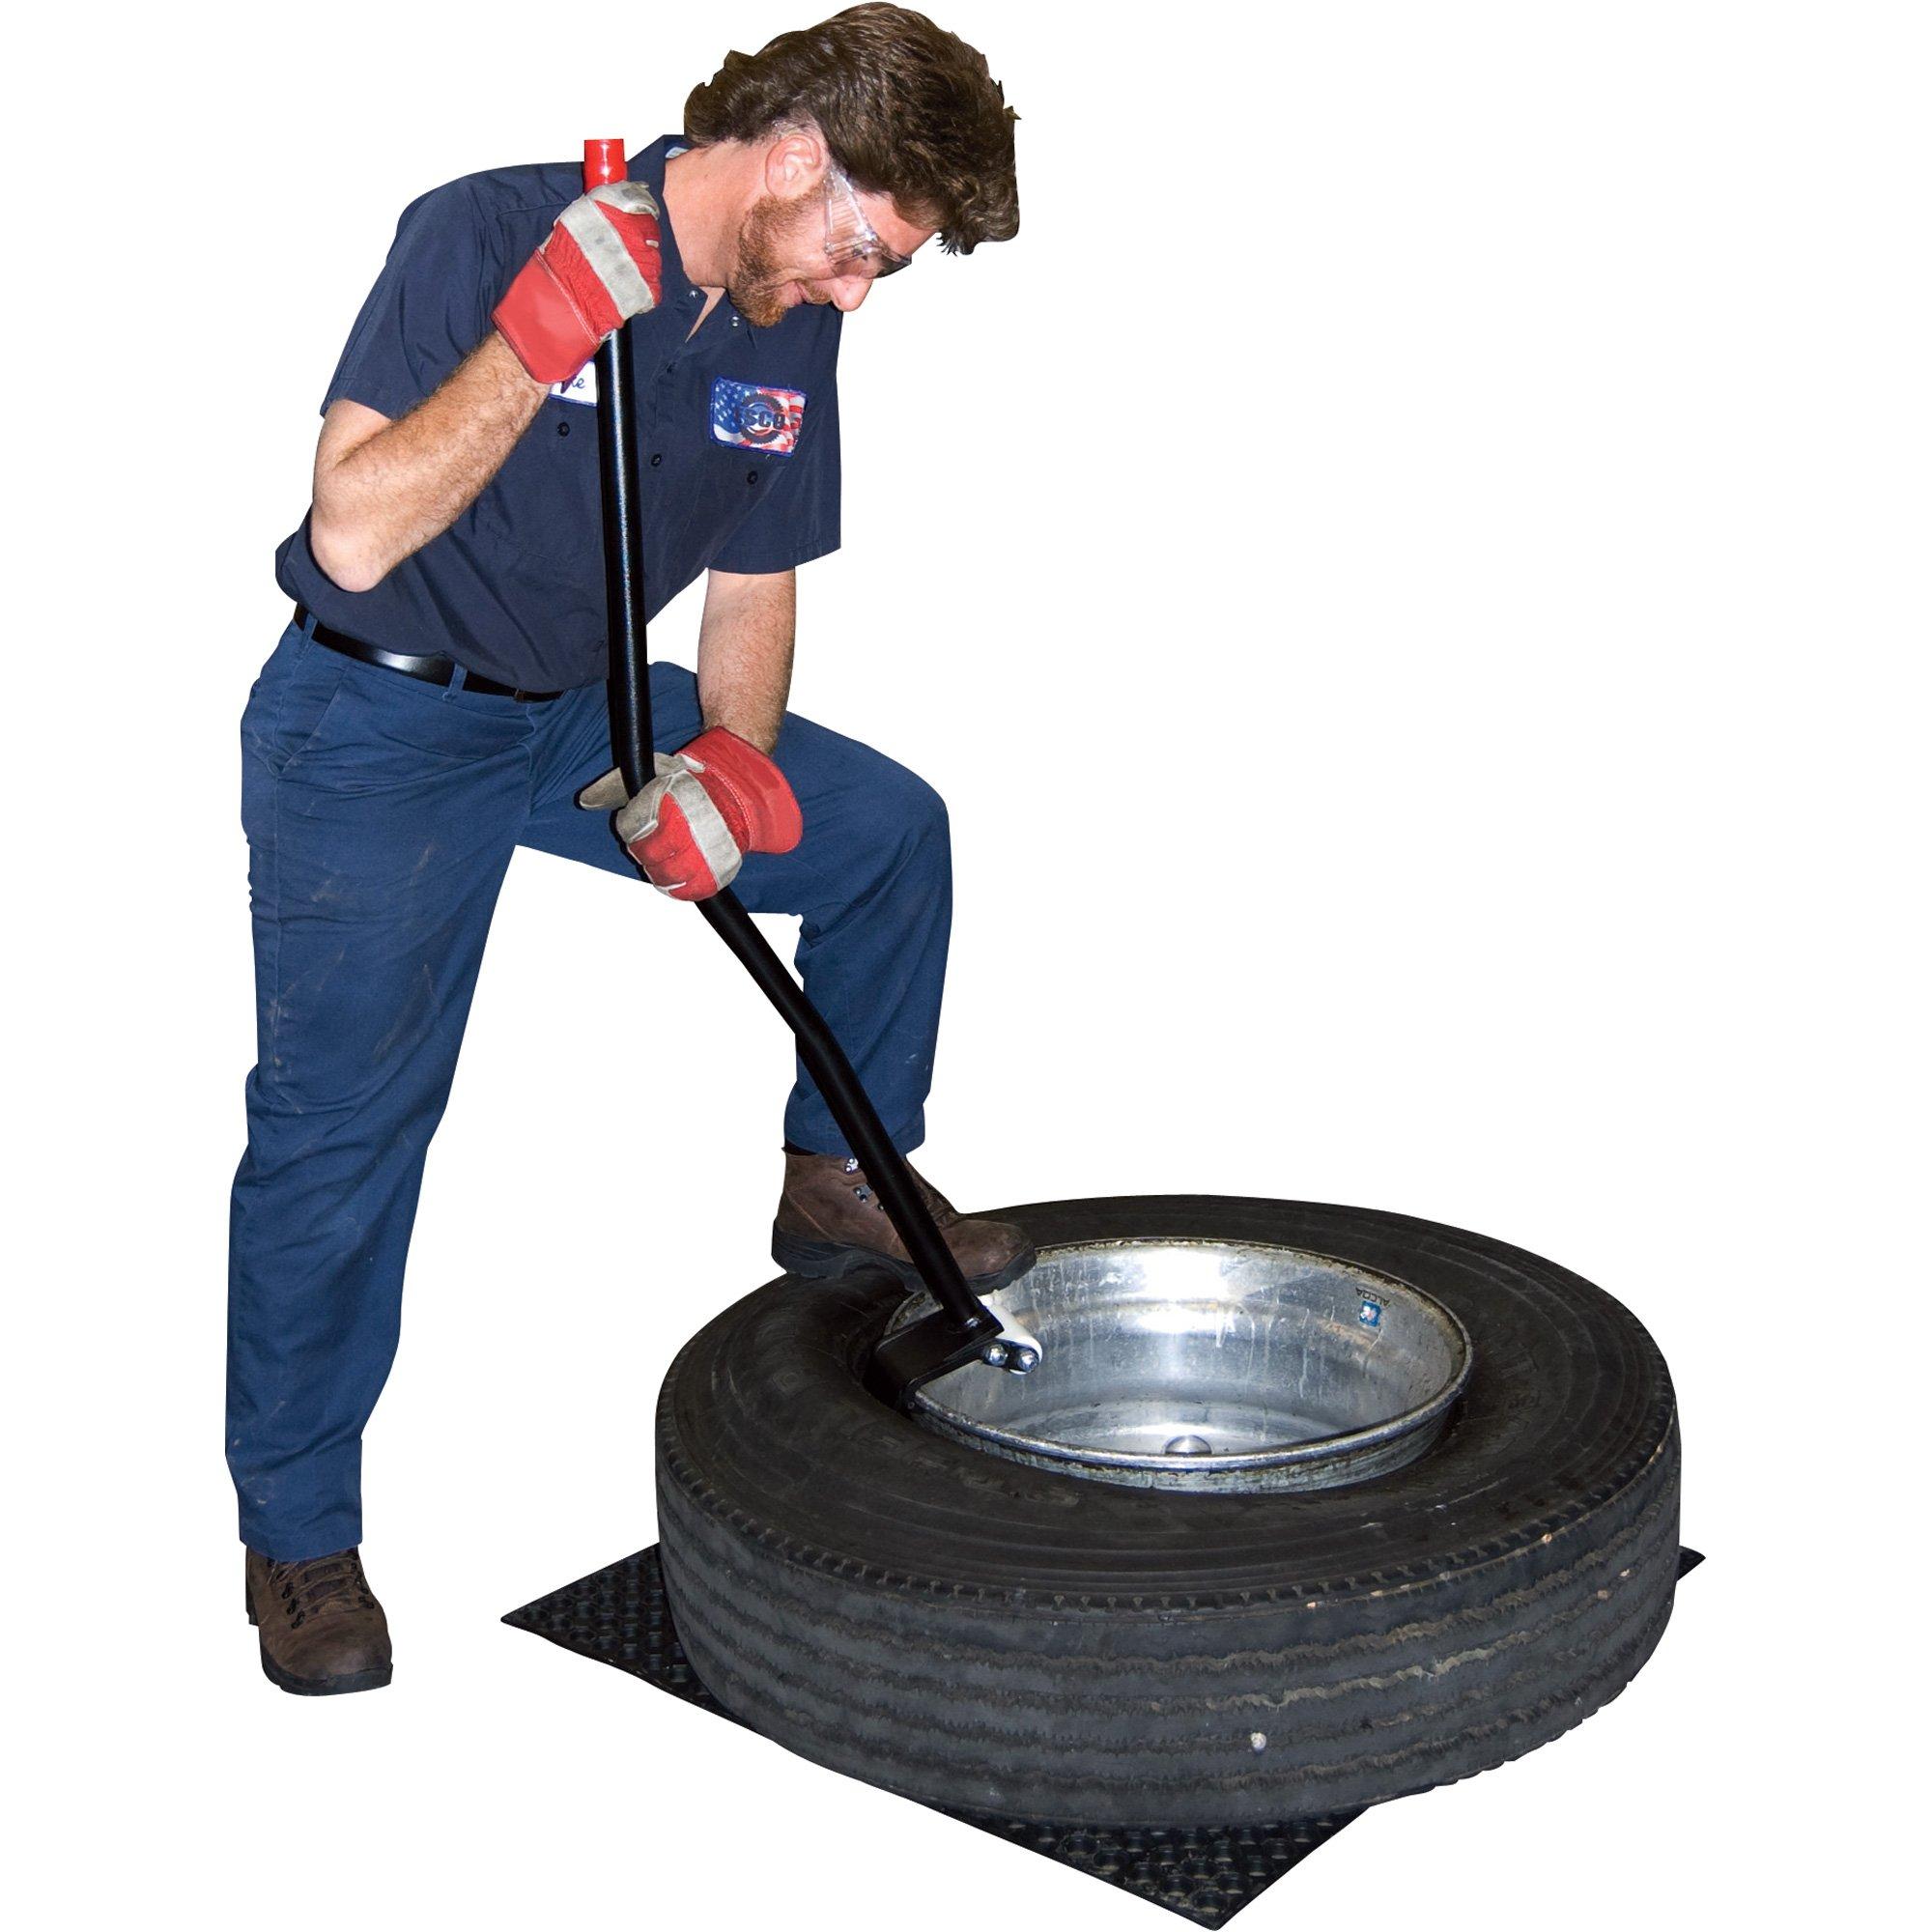 Esco Truck Tire Dismount Tool, Model# 20396-N